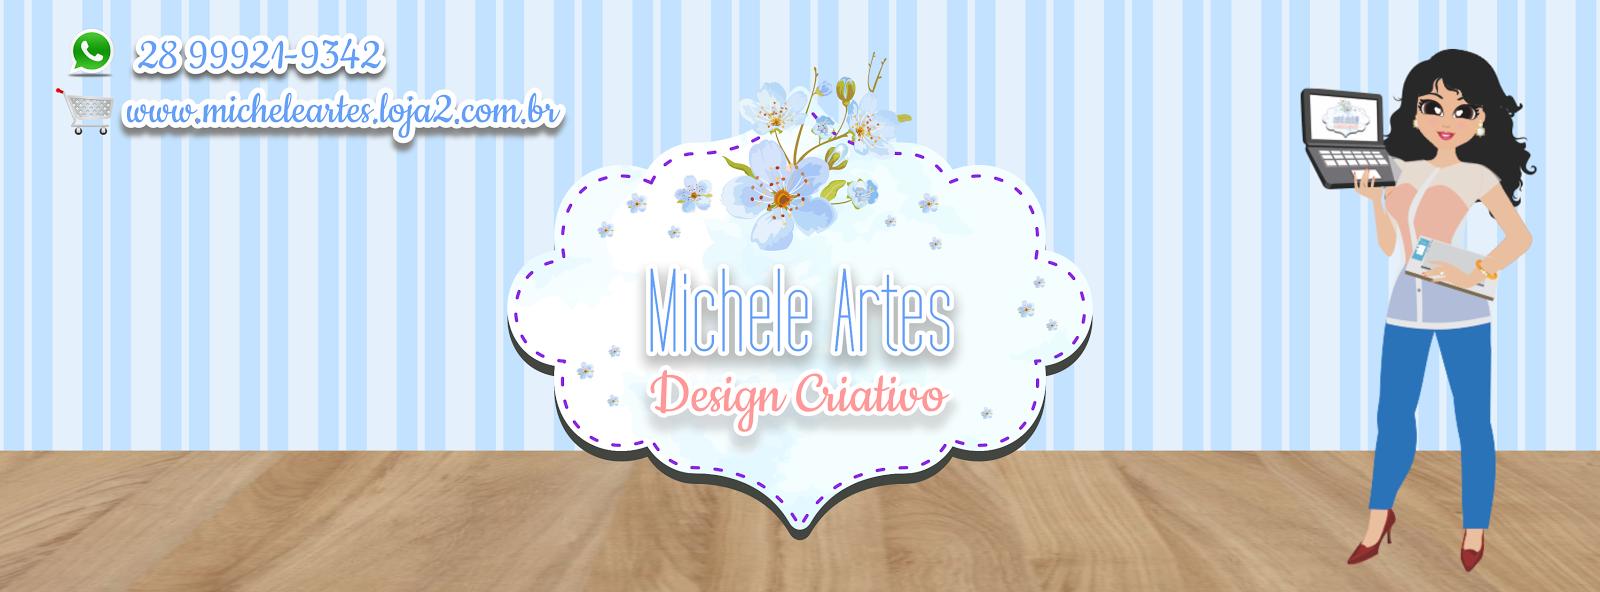 Michele Artes